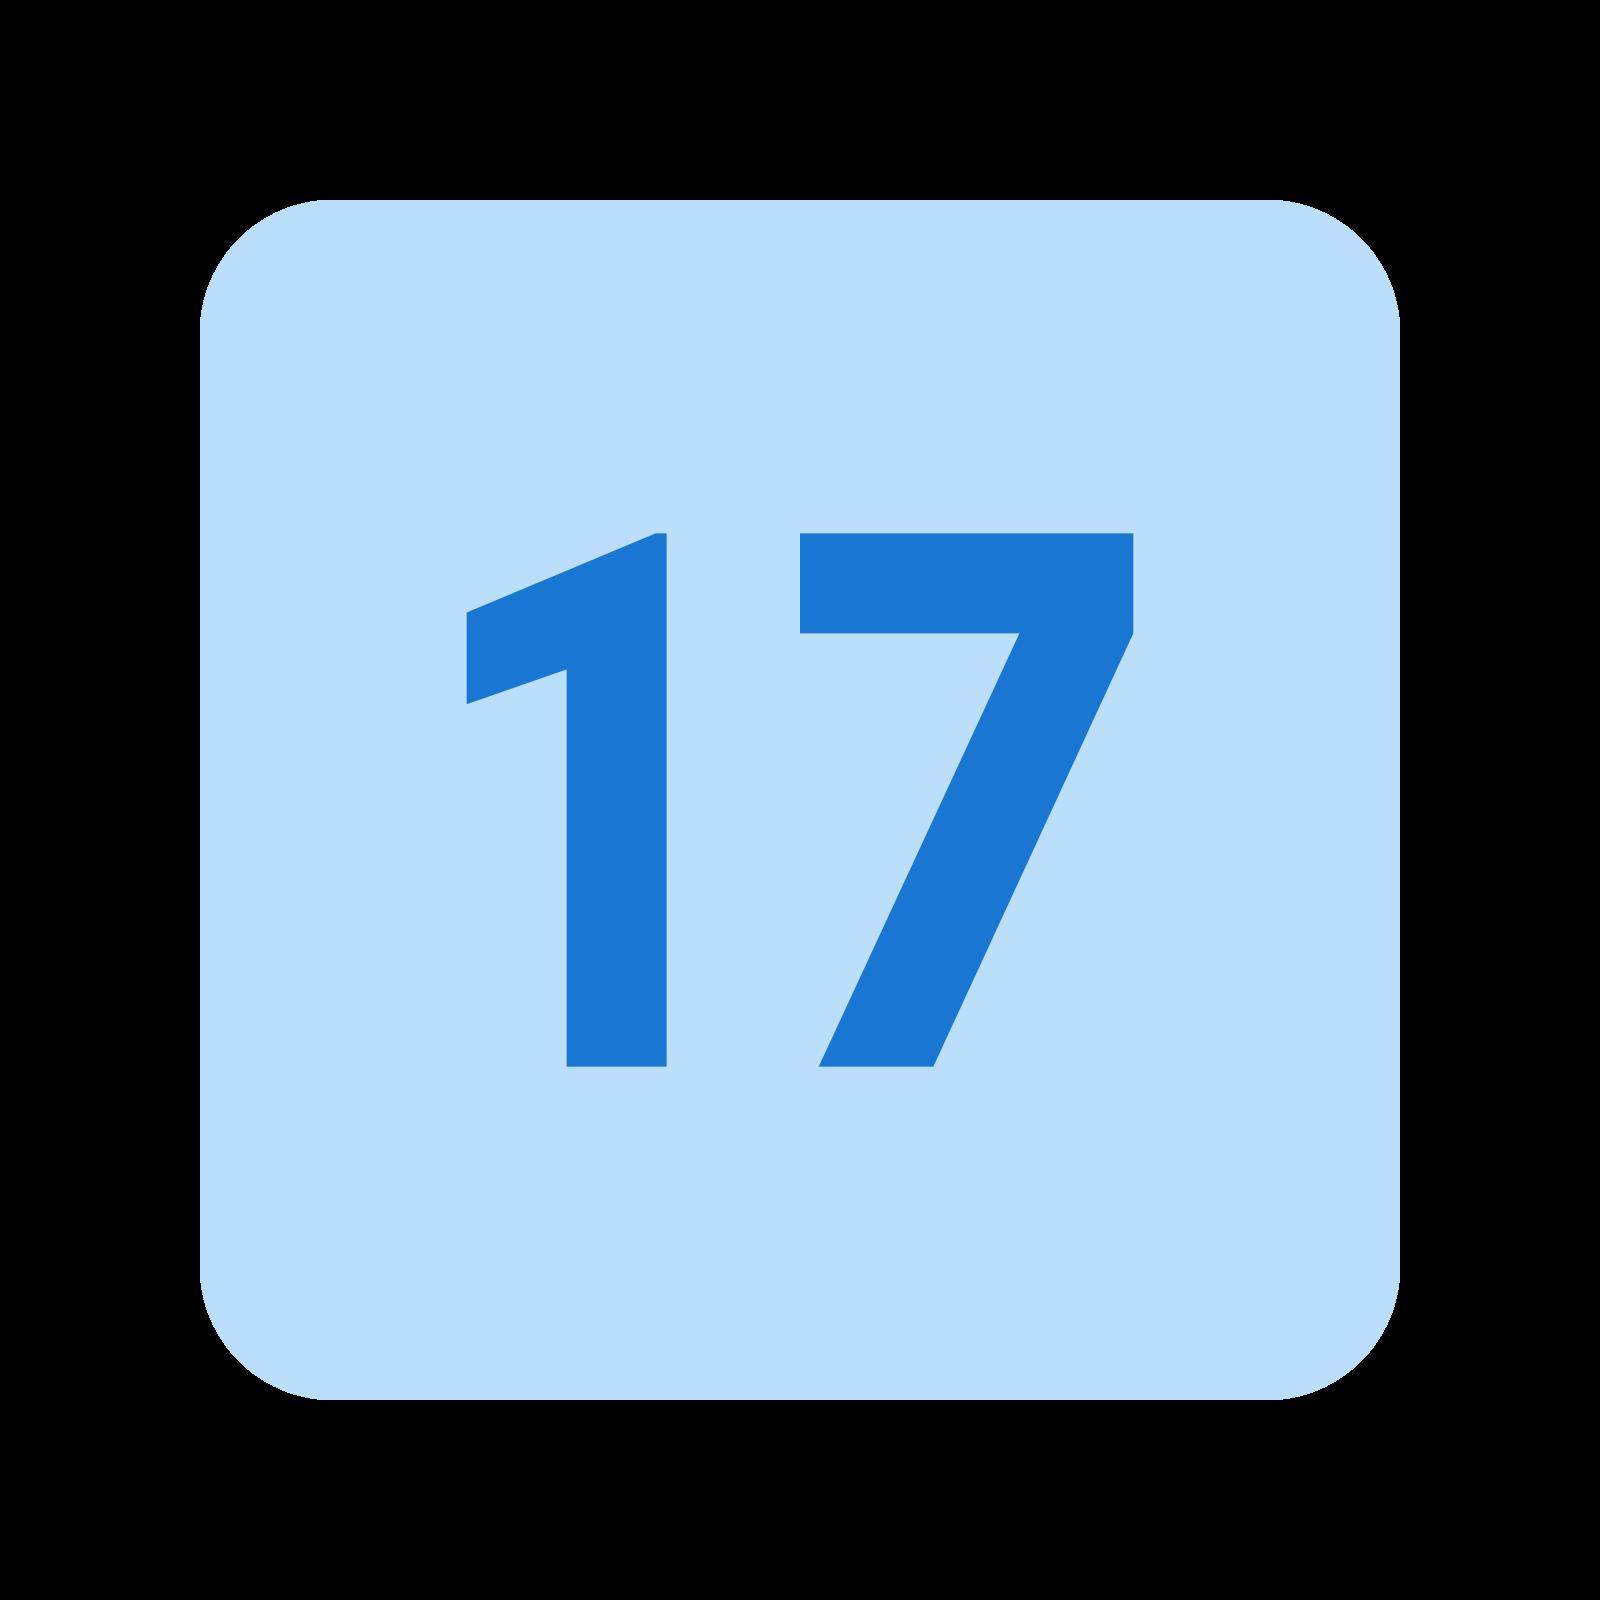 17 icon